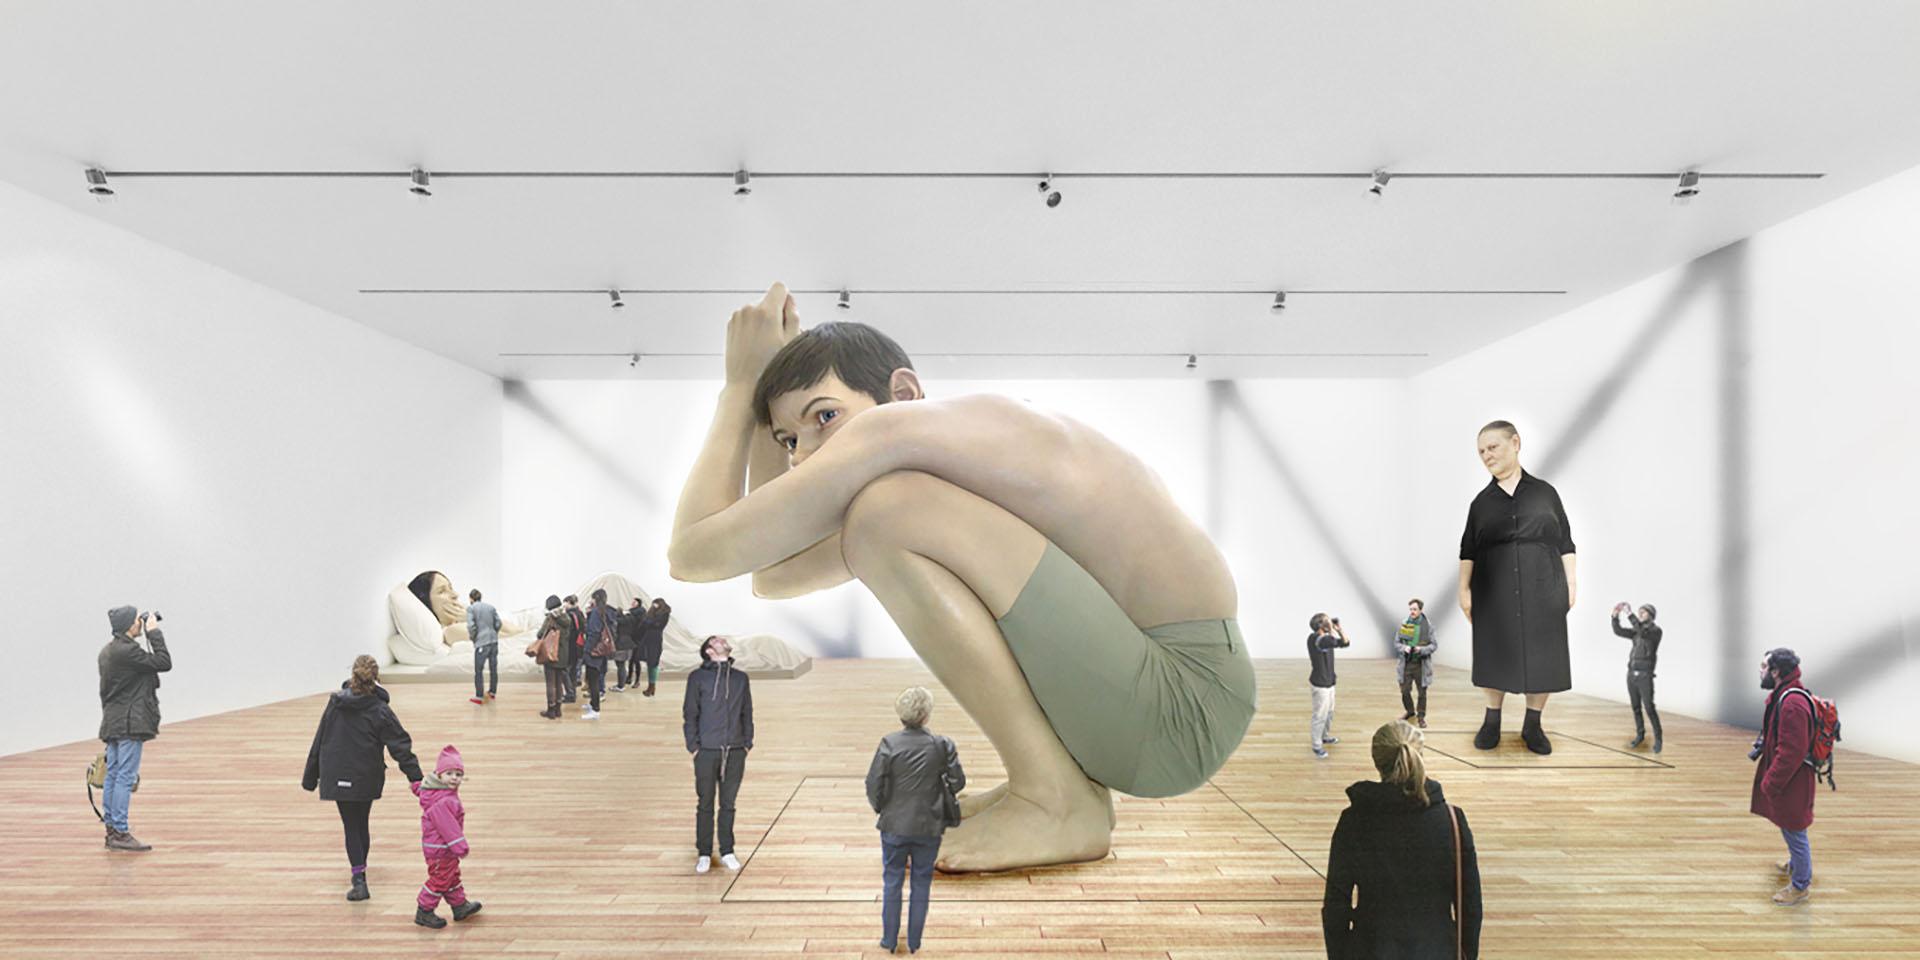 PLAYstudio_Guggenheim-Helsinki_Img (8)